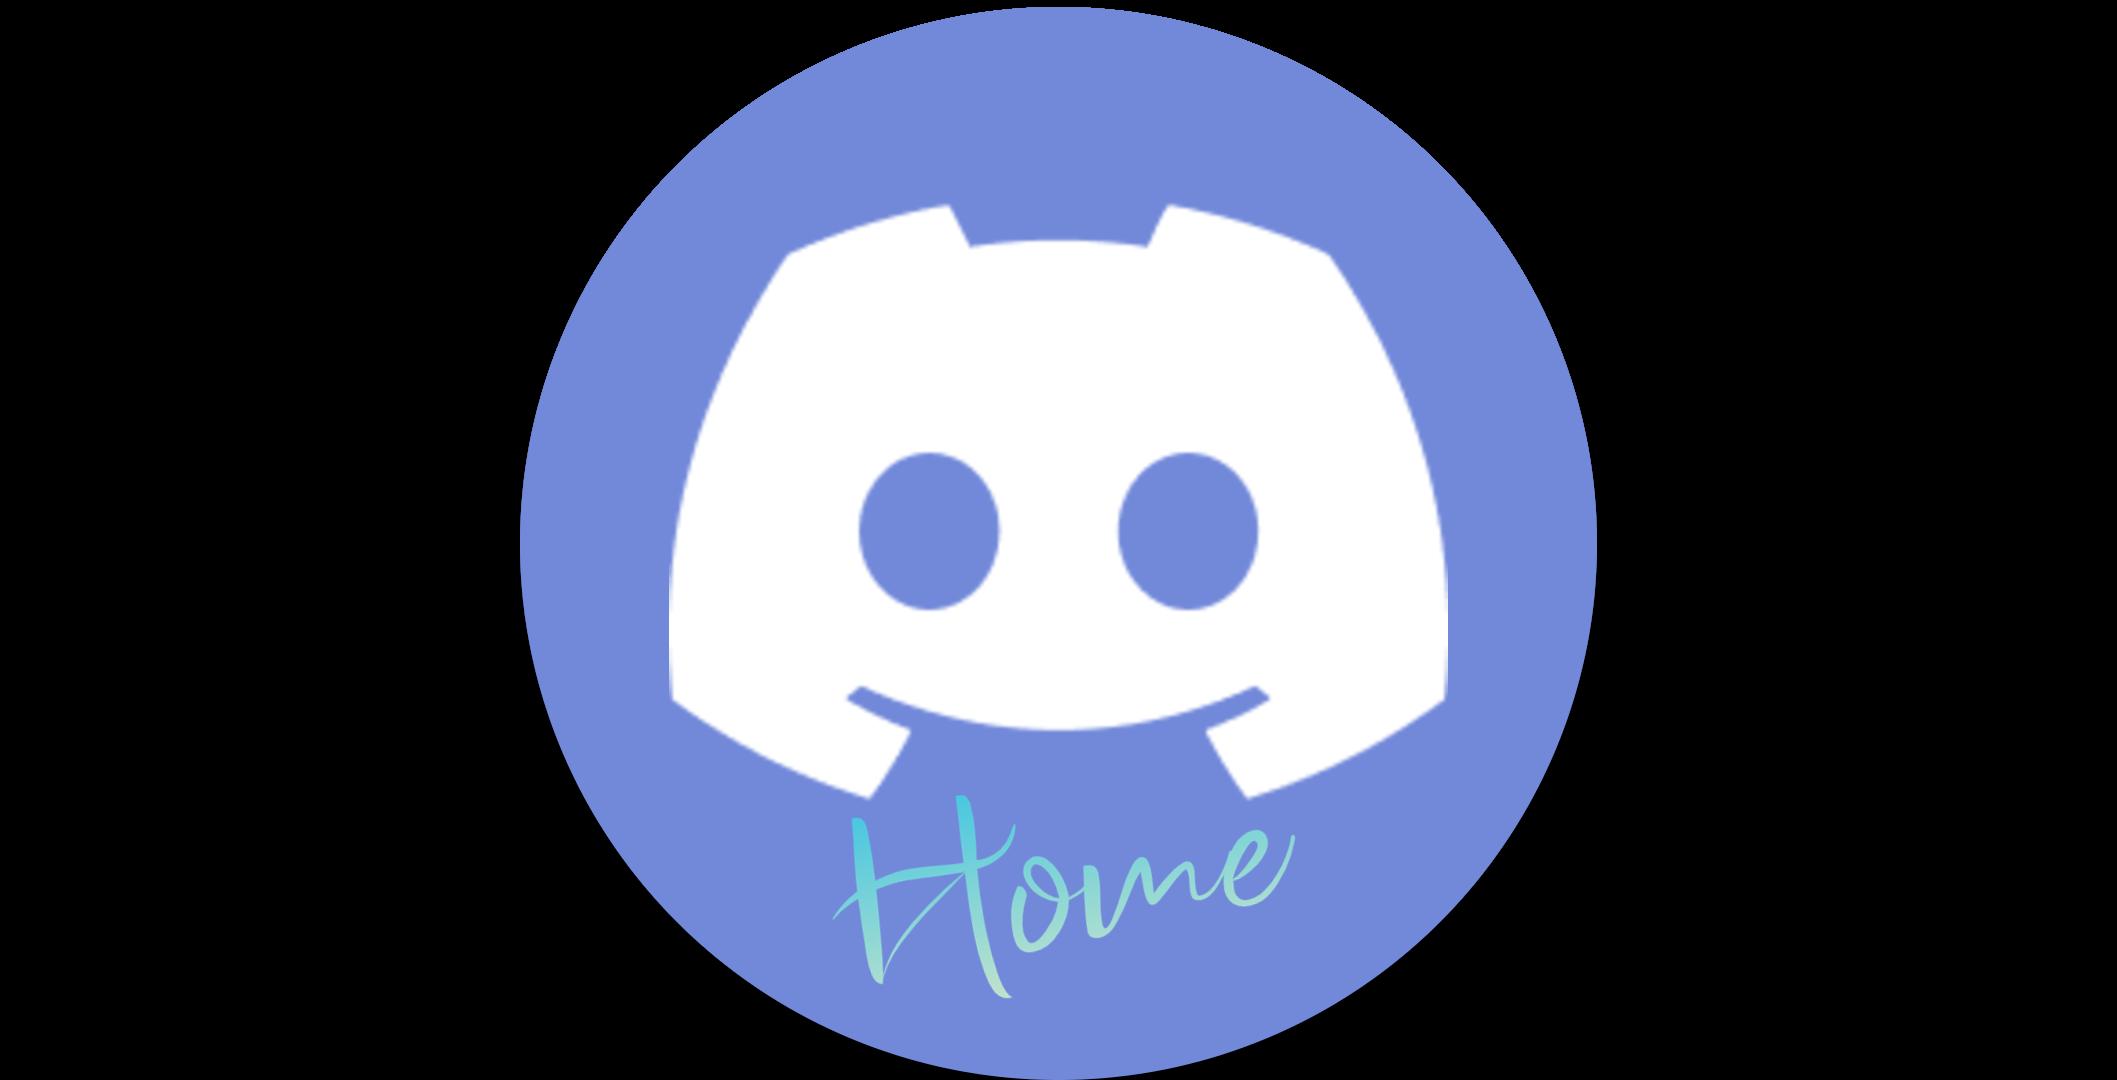 Discord Home